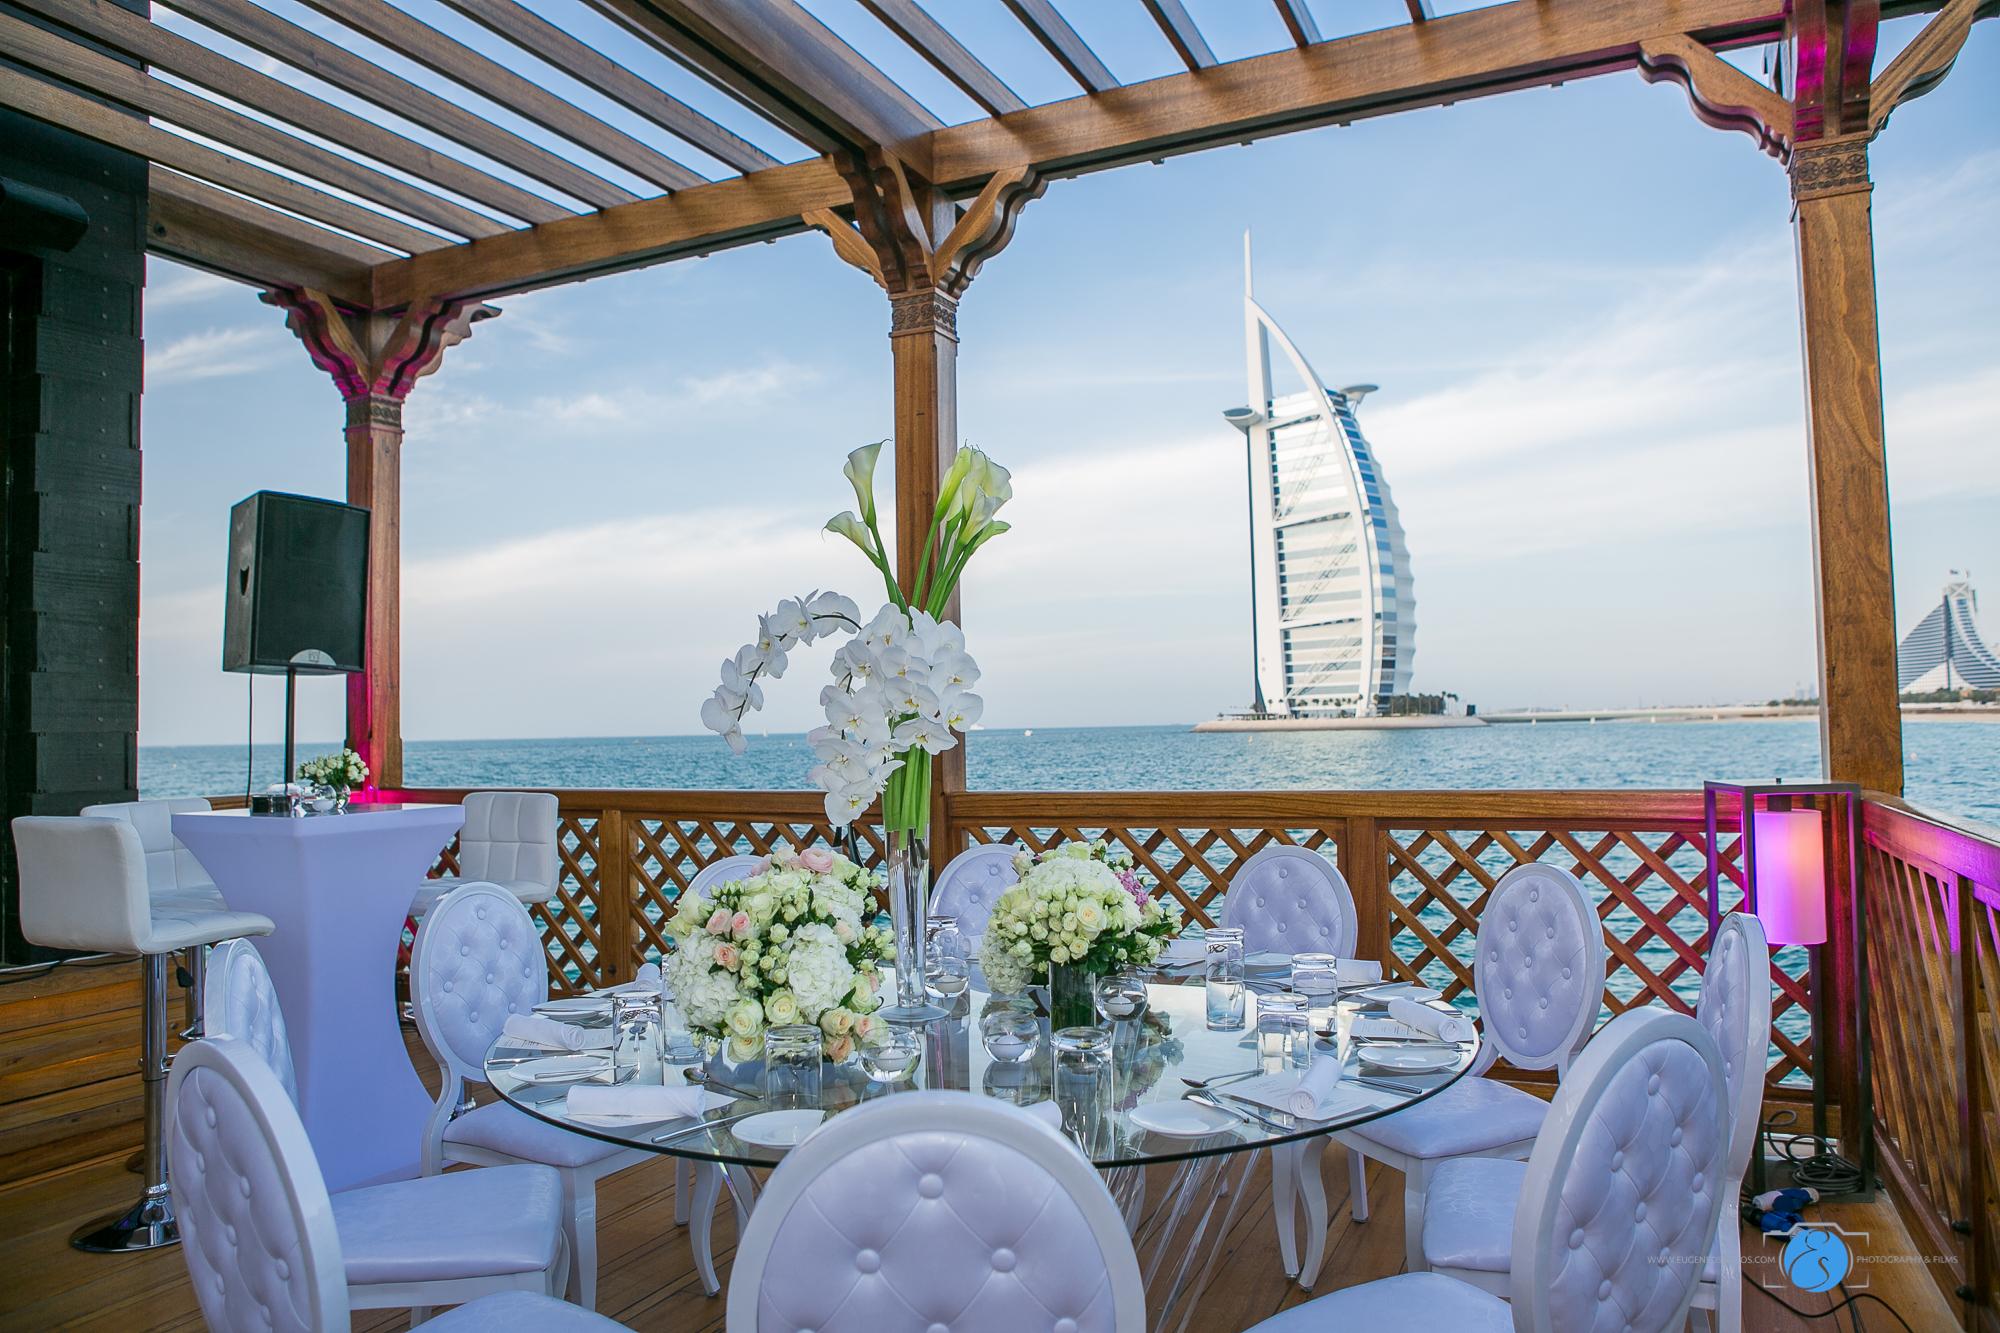 Burj Al Arab Wedding Set-up